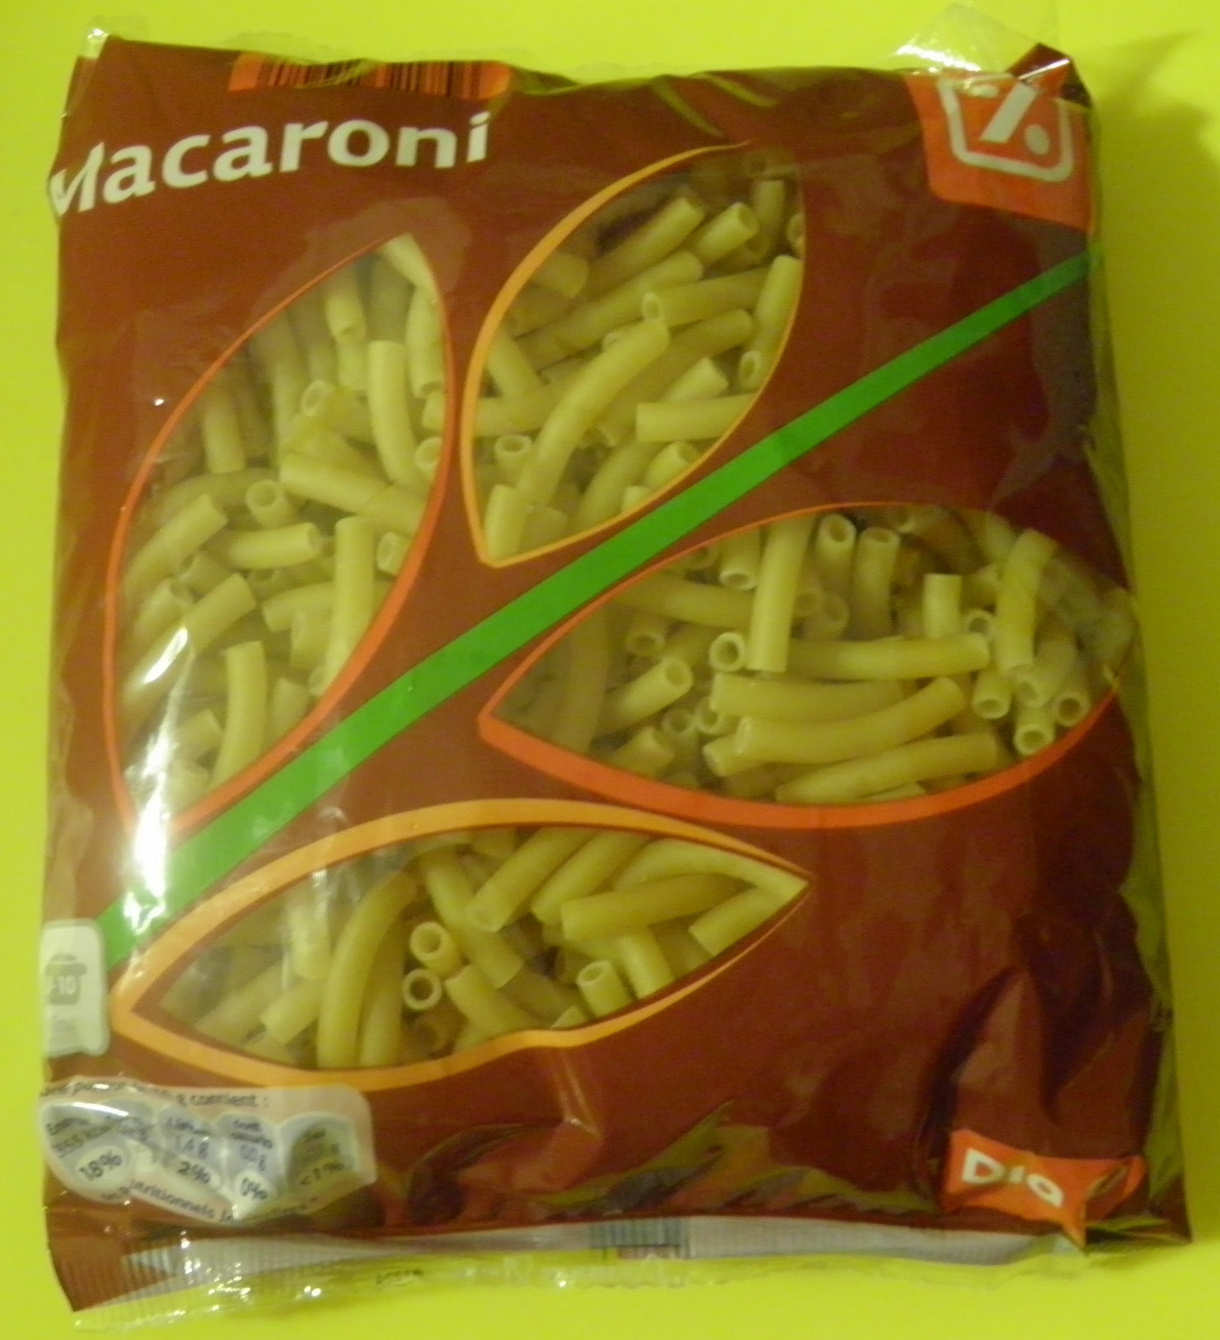 Macaroni - Produit - fr